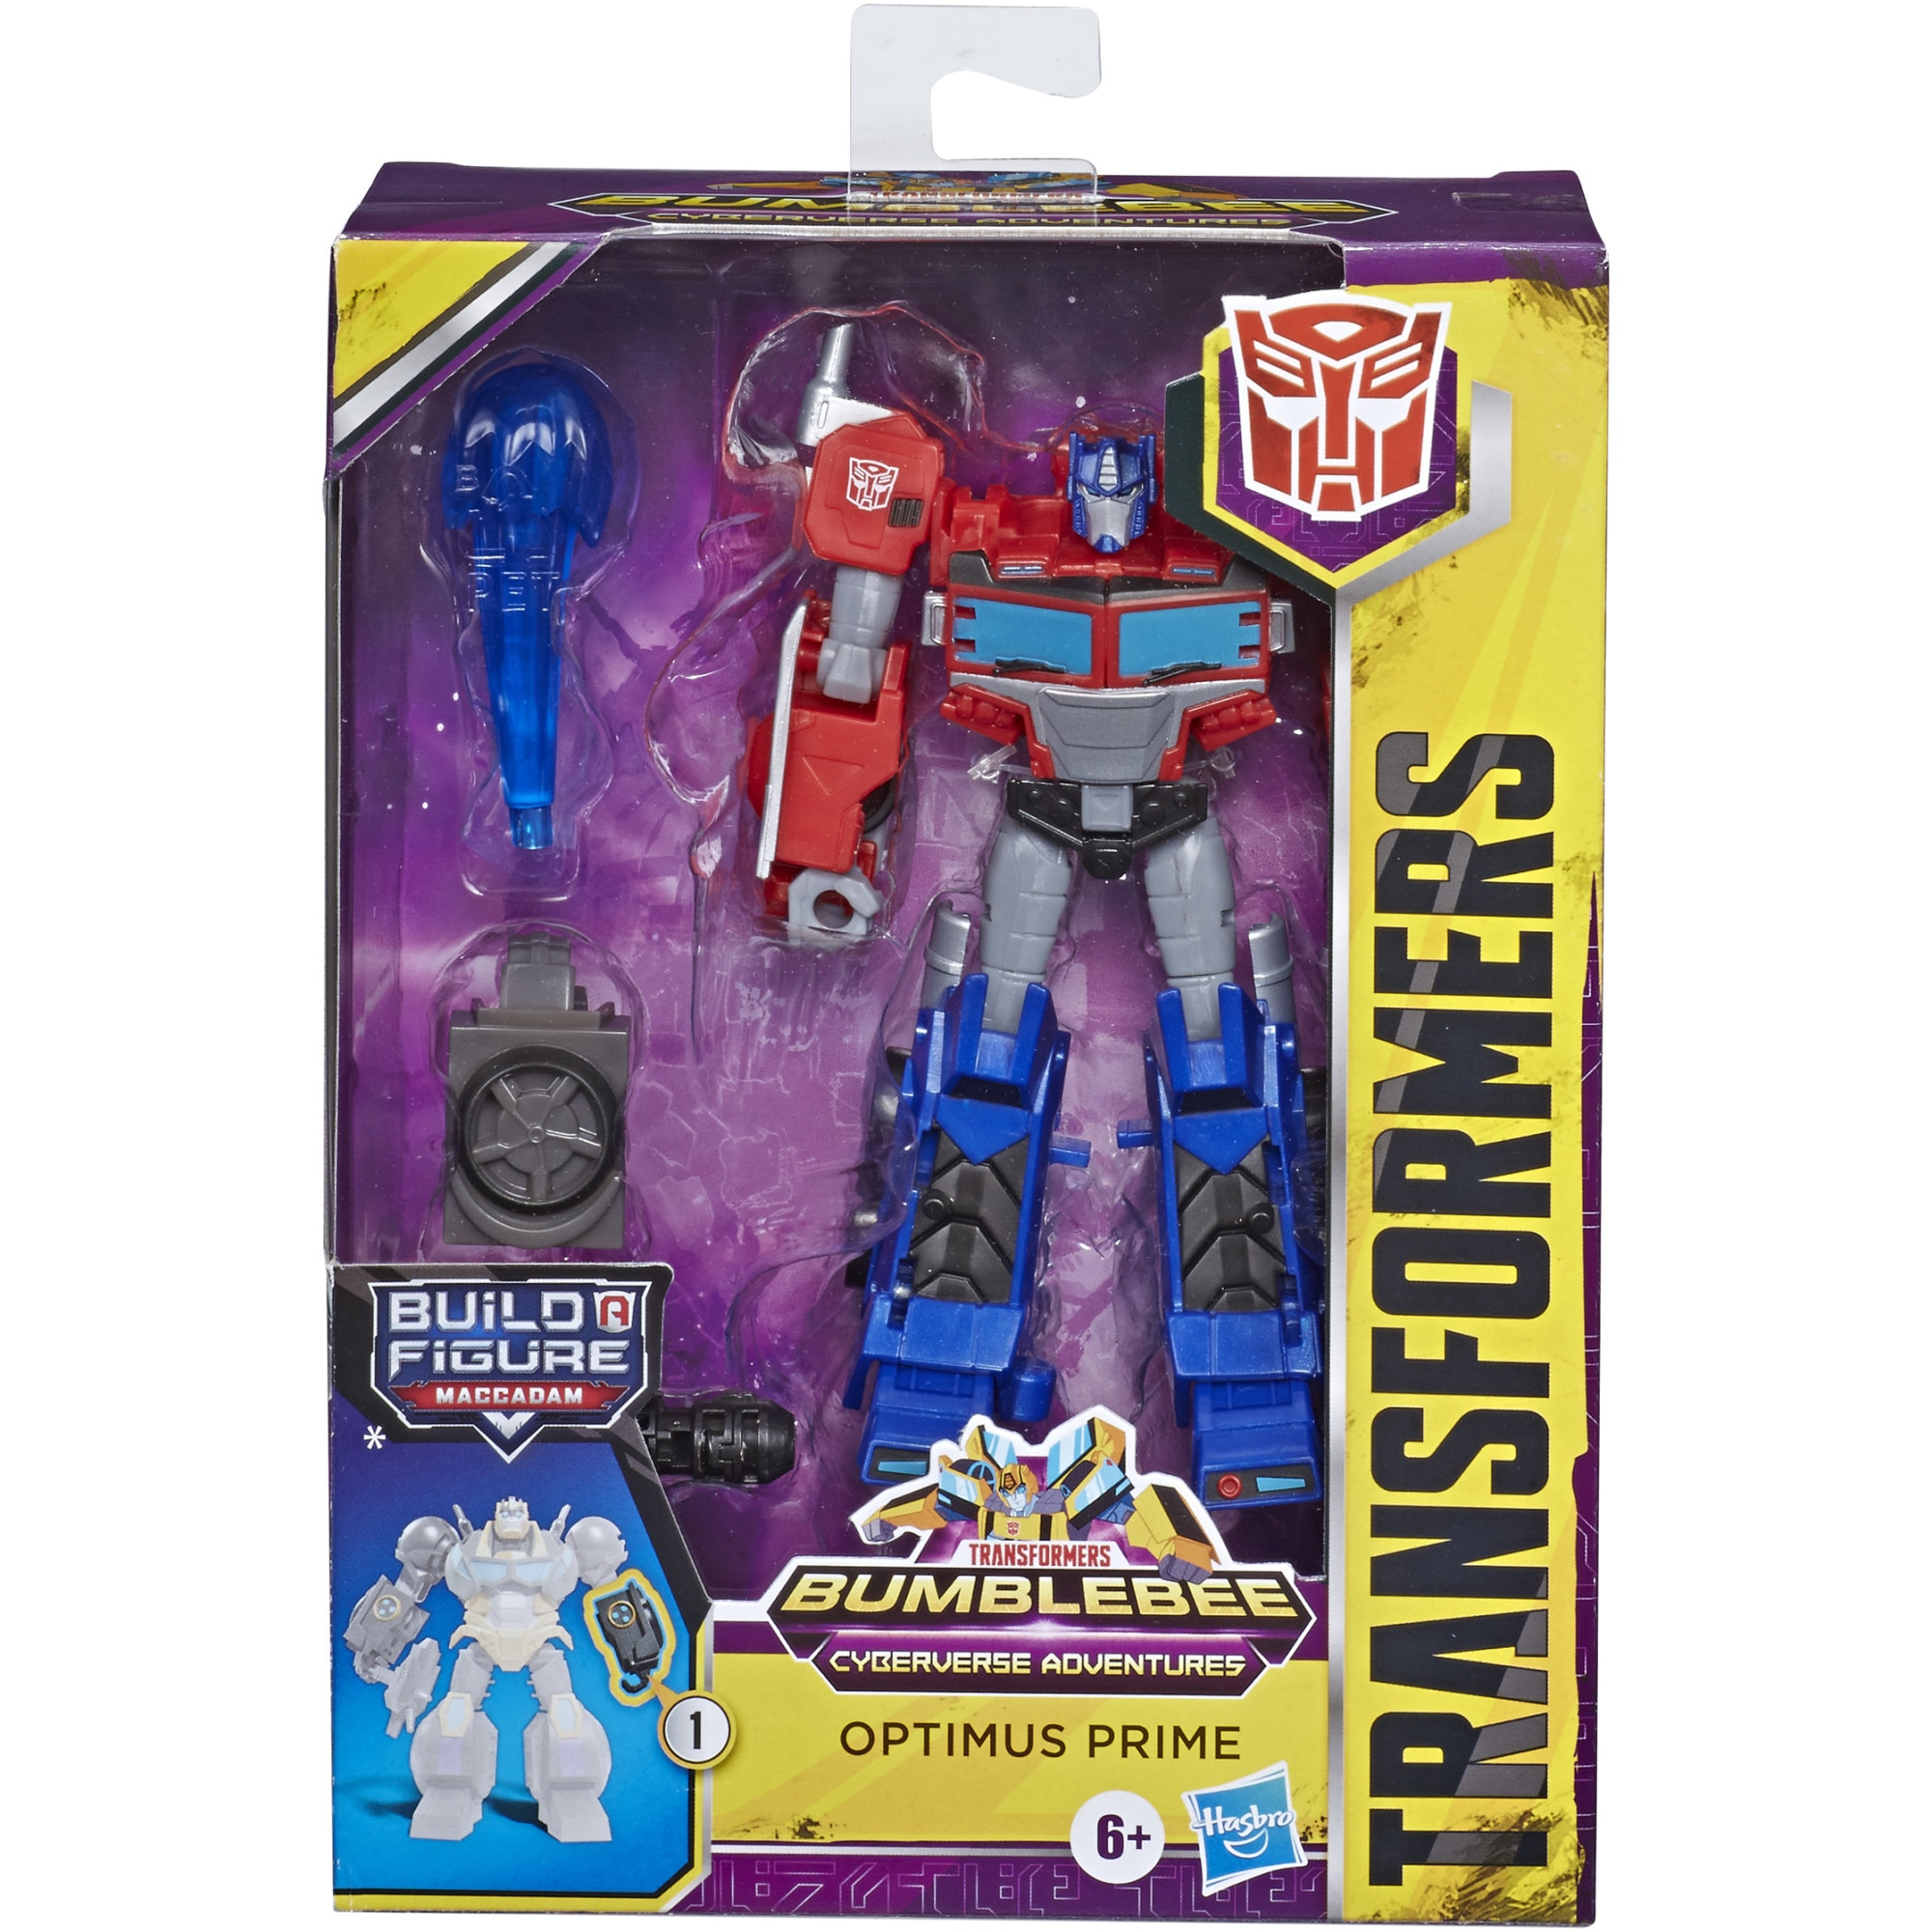 Fotografie Figurina Transformers Cyberverse Adventures Deluxe - Optimus Prime, 12 cm